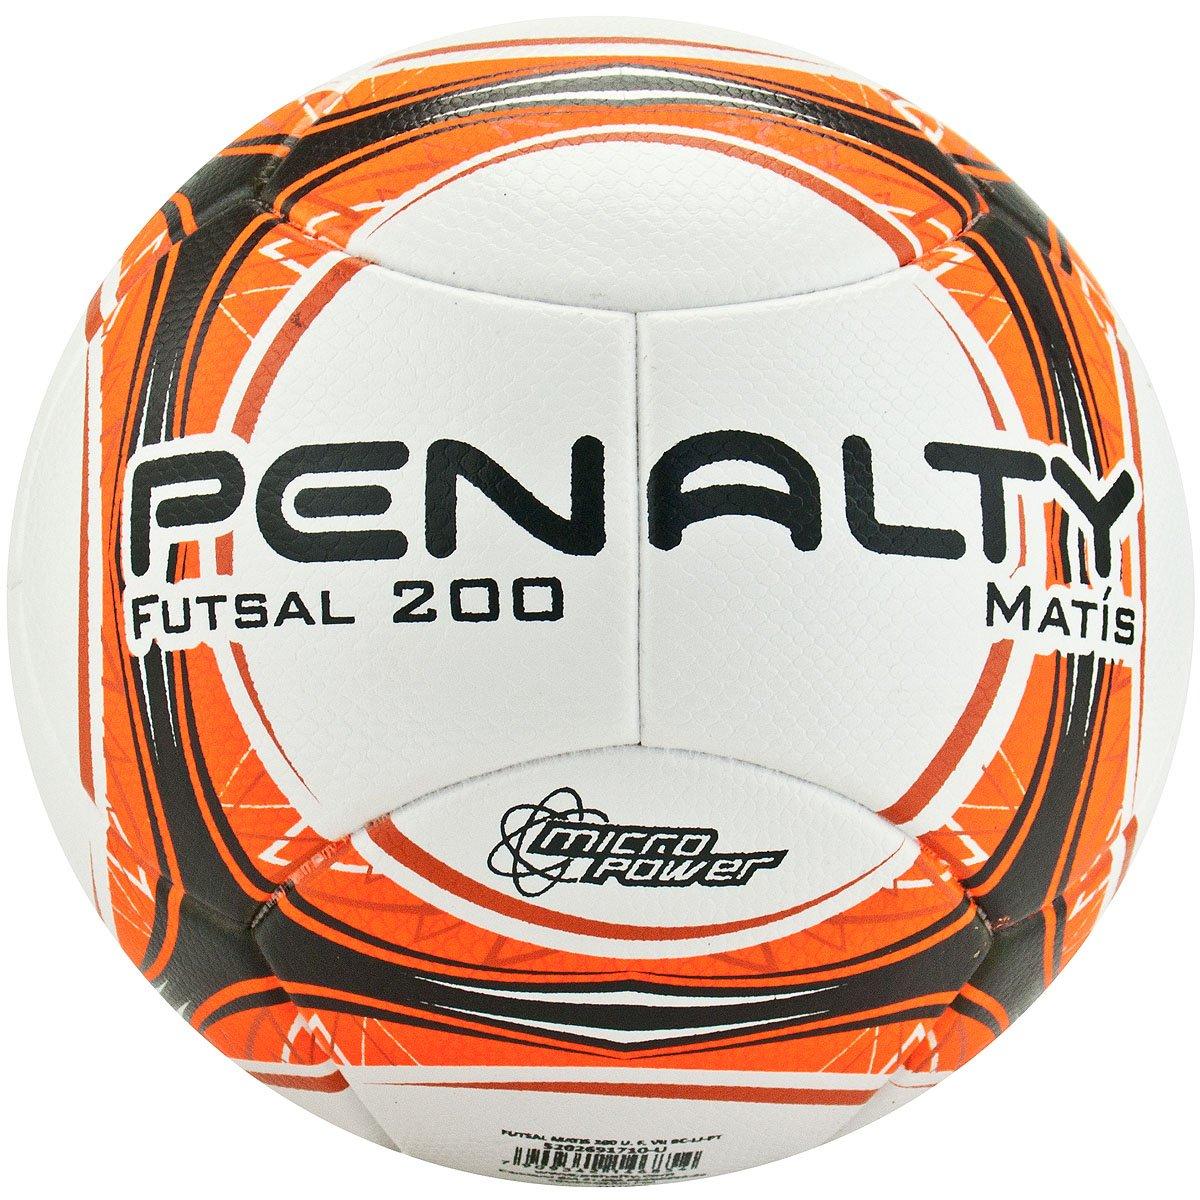 Bola Penalty Futsal Matis 200 Ultra Fusion VII 520269 11625920eafb5